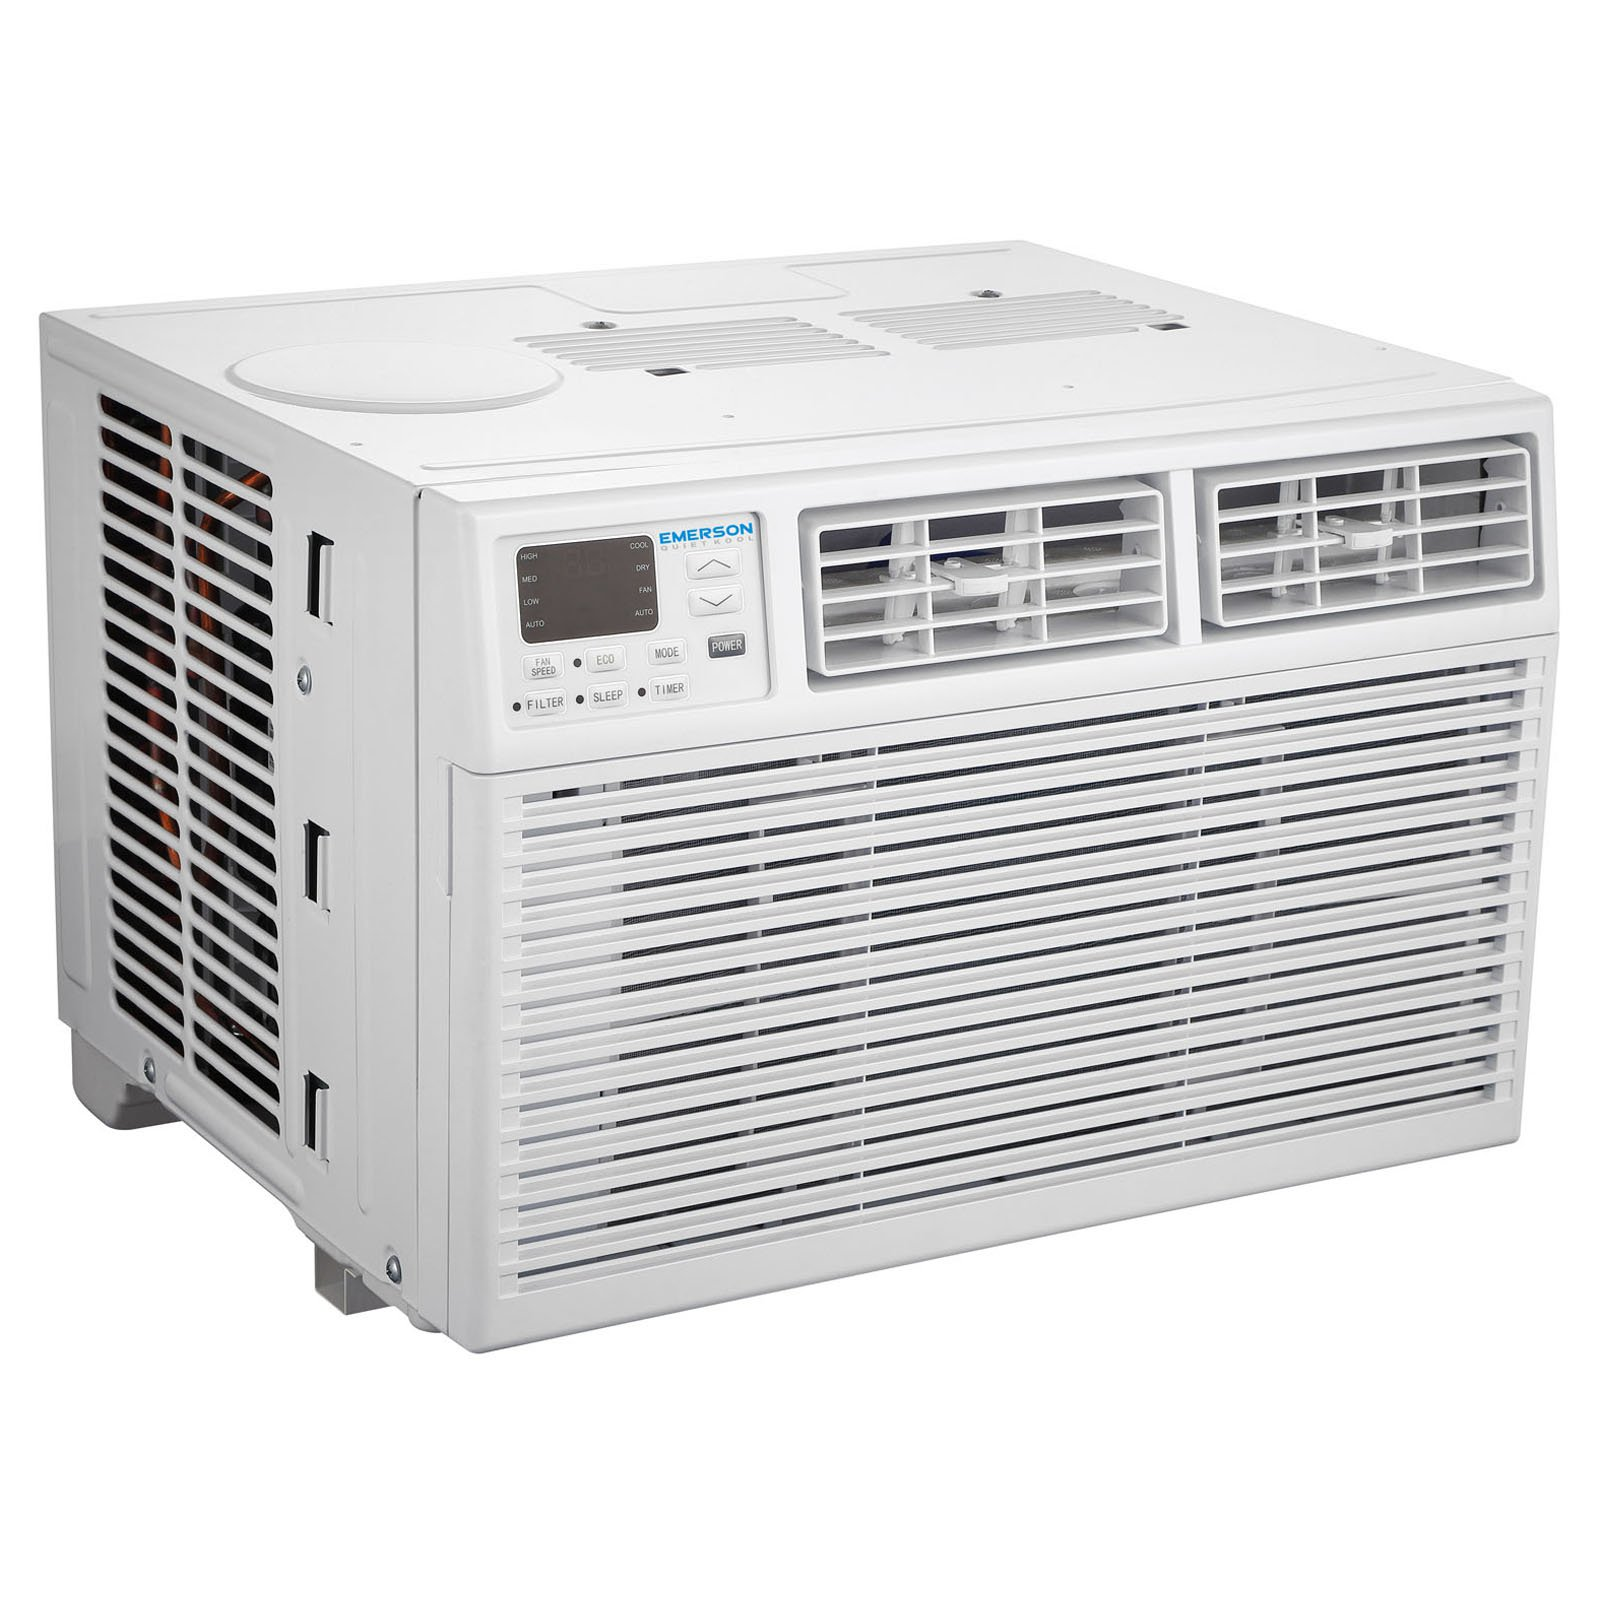 Emerson Quiet Kool 10000 Btu 115v Window Air Conditioner With